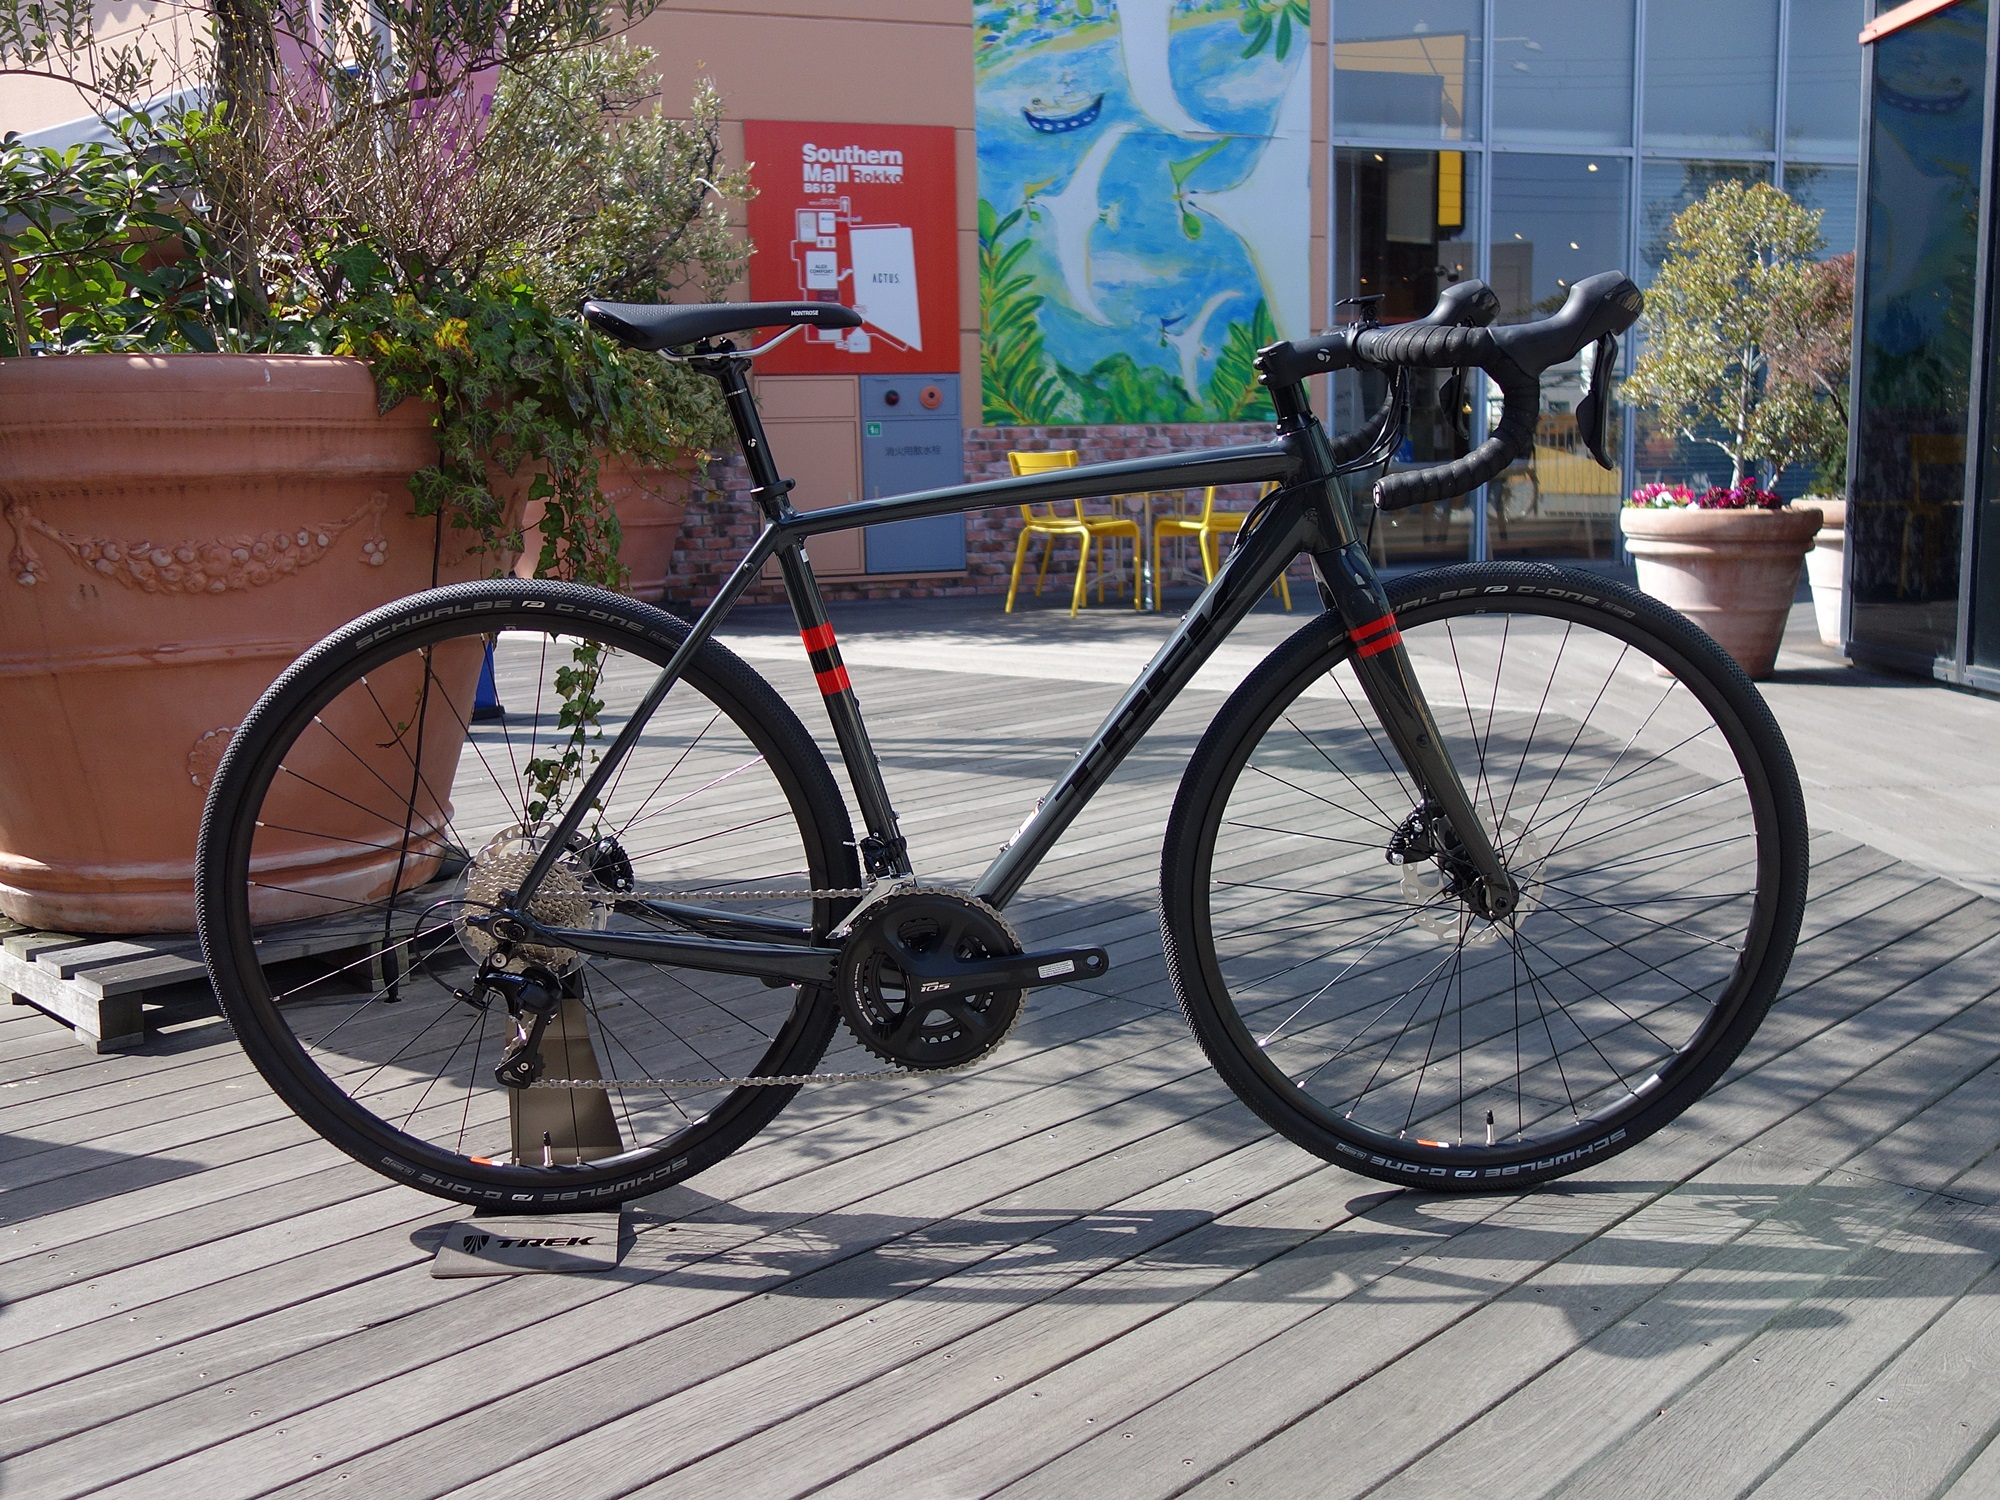 TREK Bicycle 神戸六甲★この週末にすぐ持って帰れる★即納OK!なクロスバイク・ロードバイク(3/16更新)&★話題のNEWバイク…